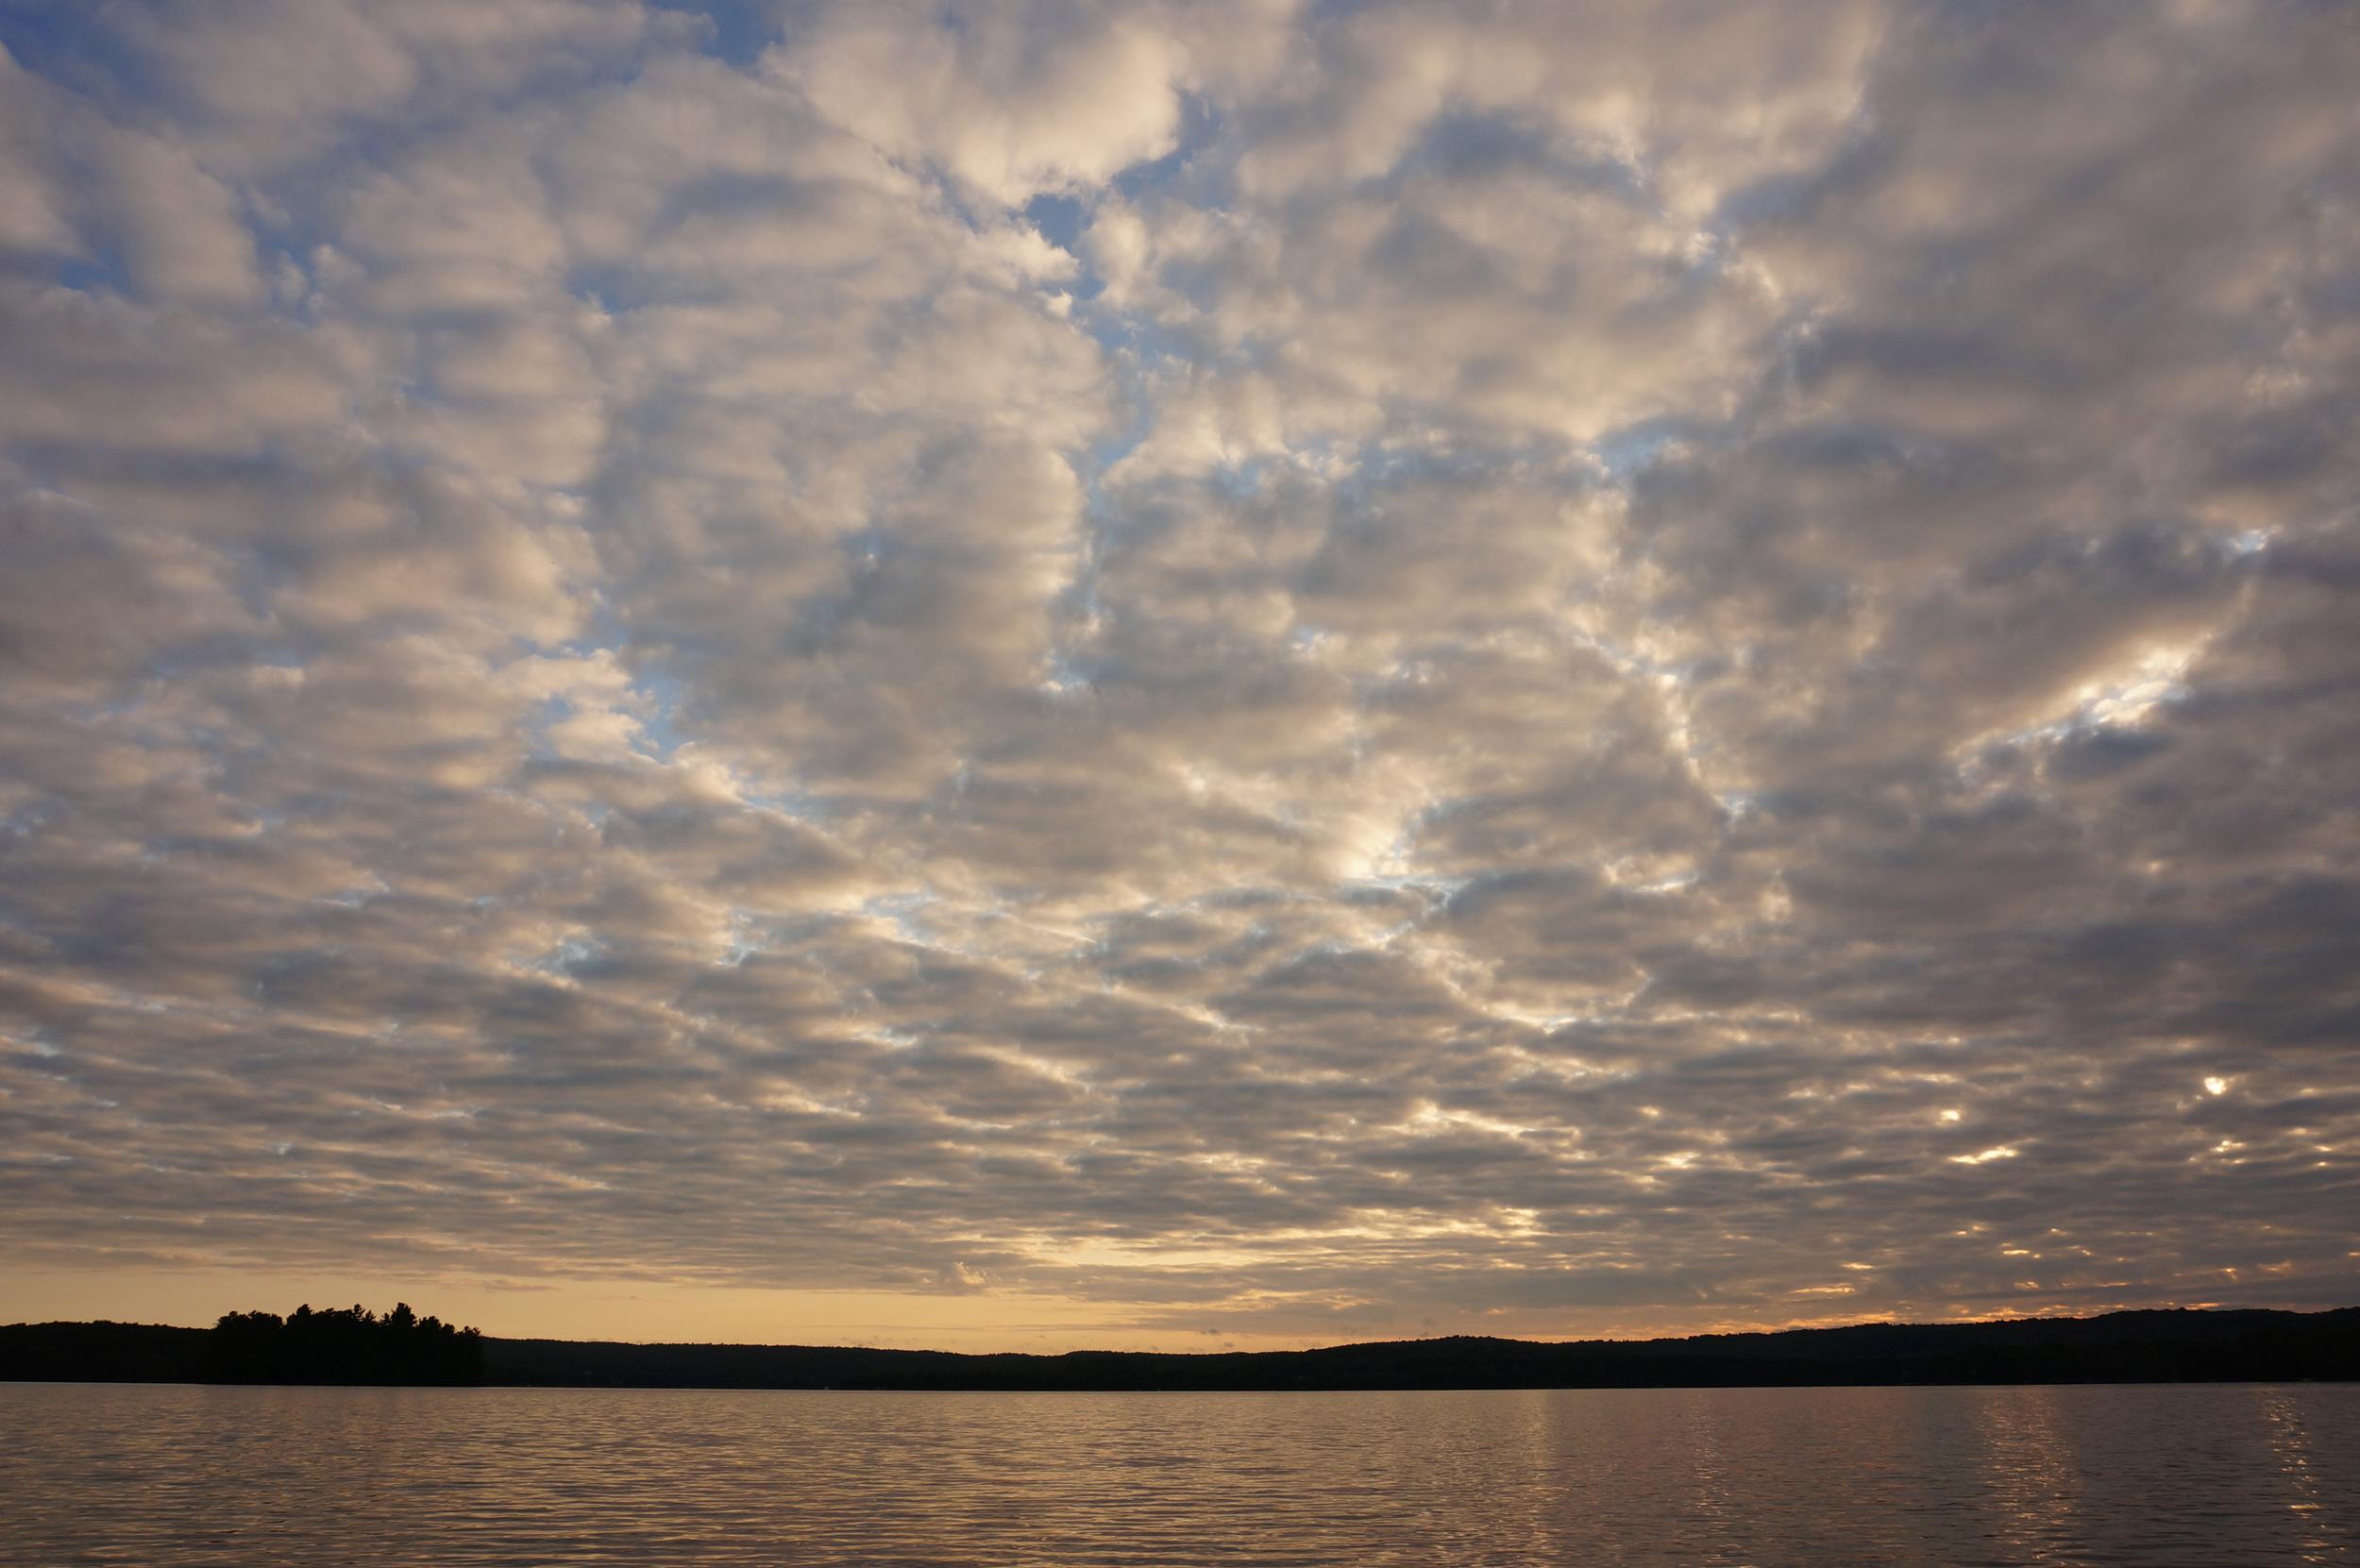 Penn Lake, Muskoka